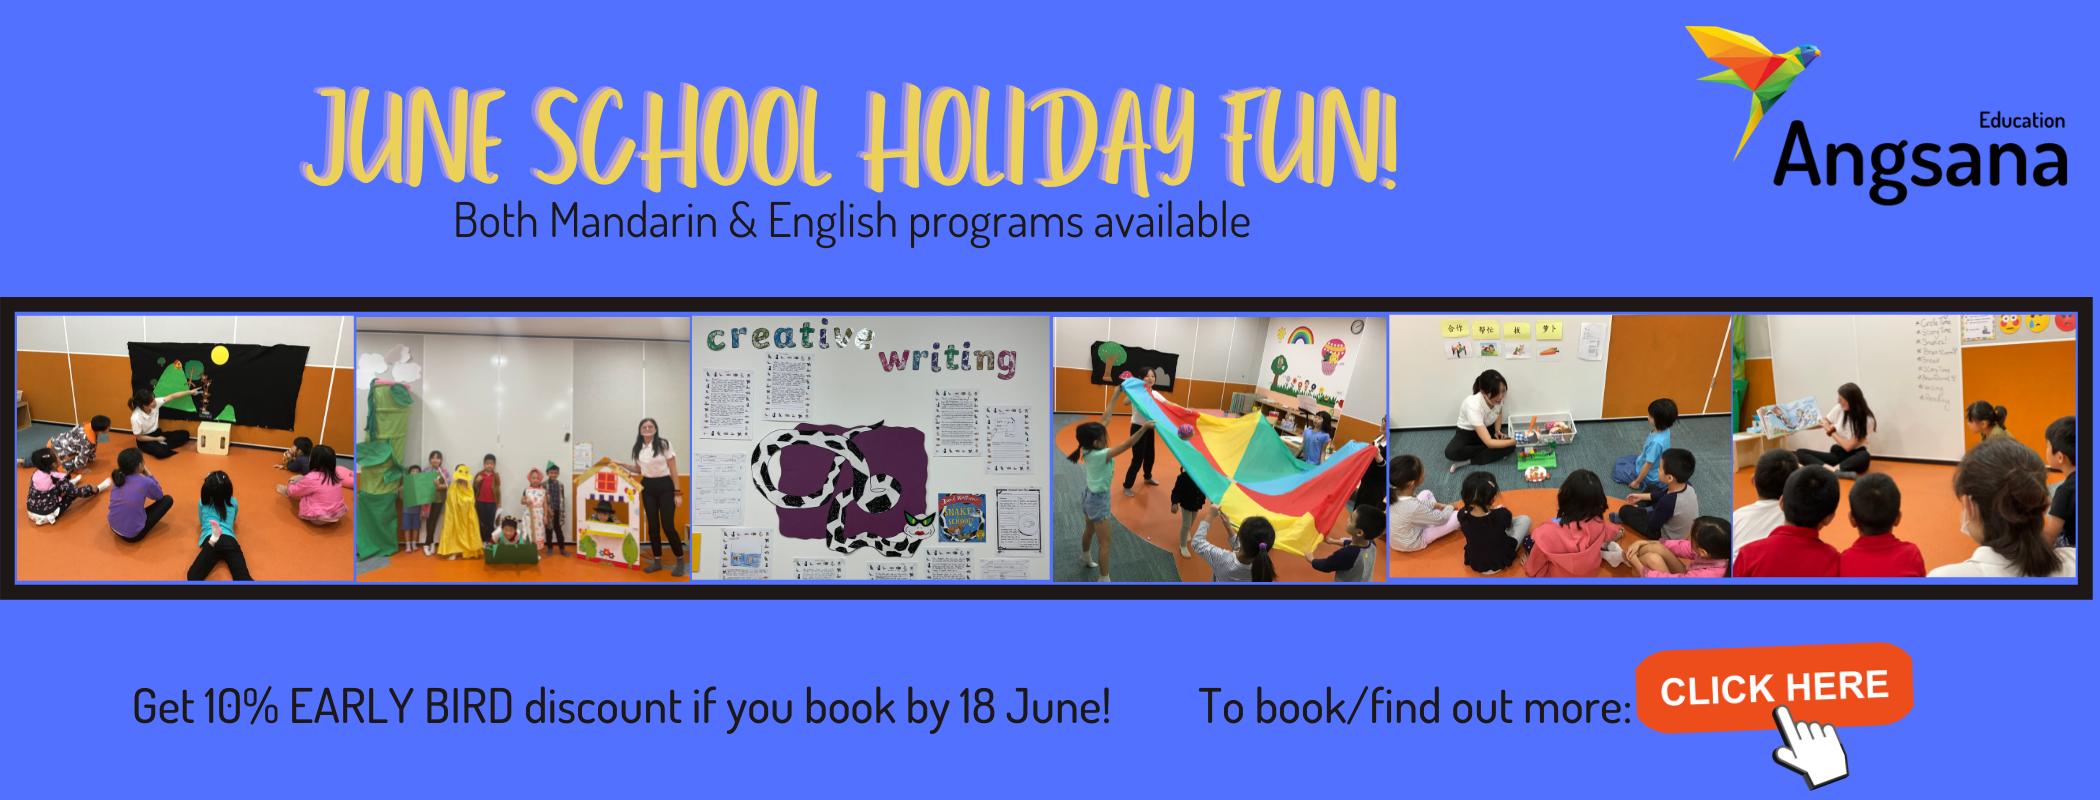 June School holiday fun 2100x800 (1)